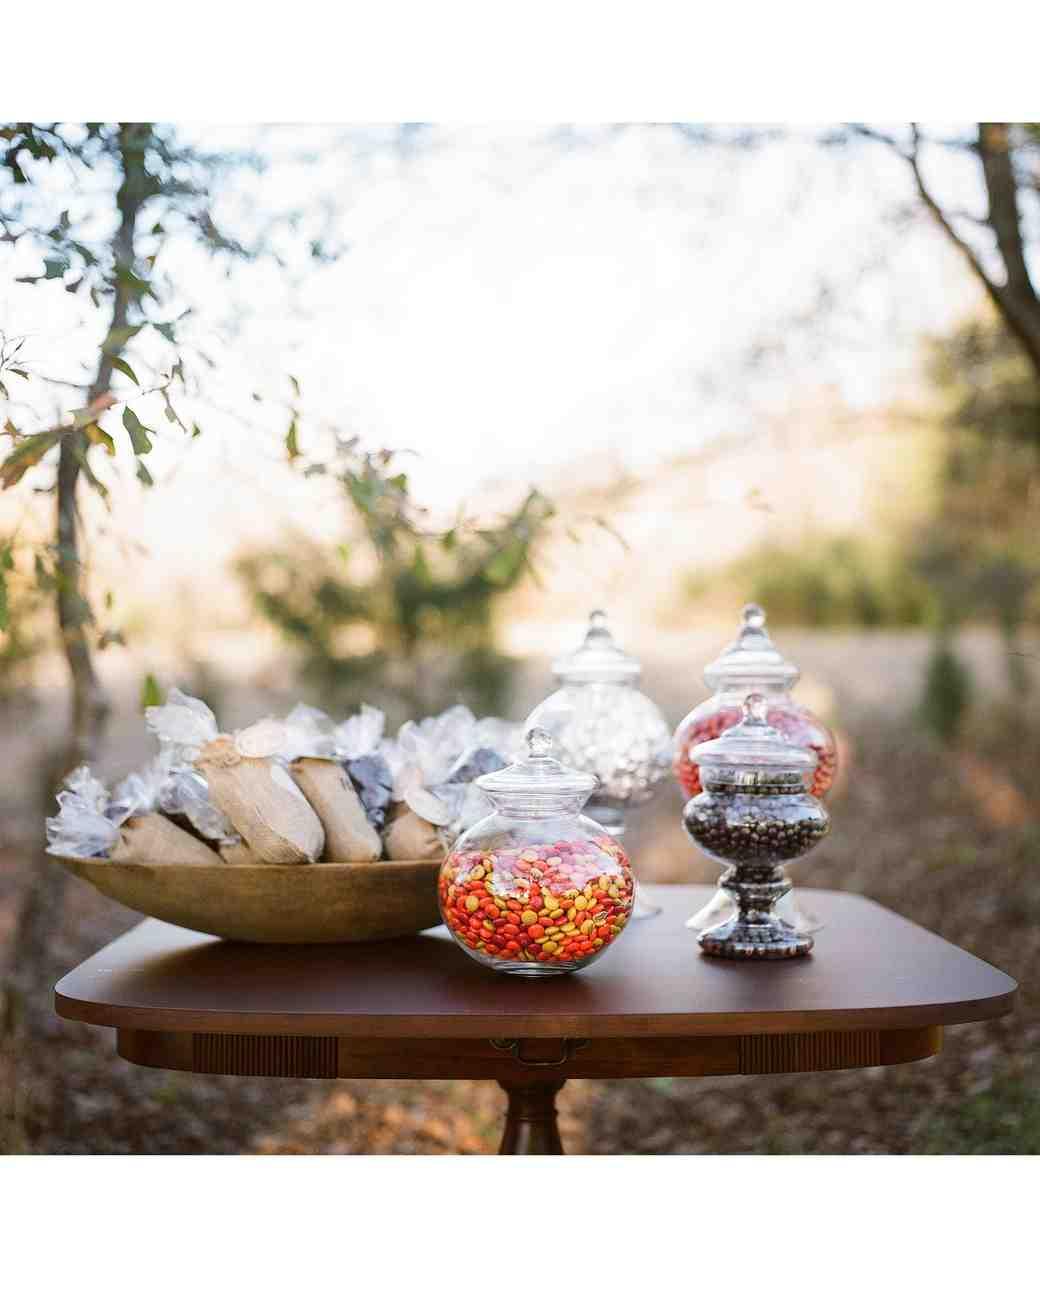 katie-nathan-wedding-thanksgiving-candy-287-s113017.jpg